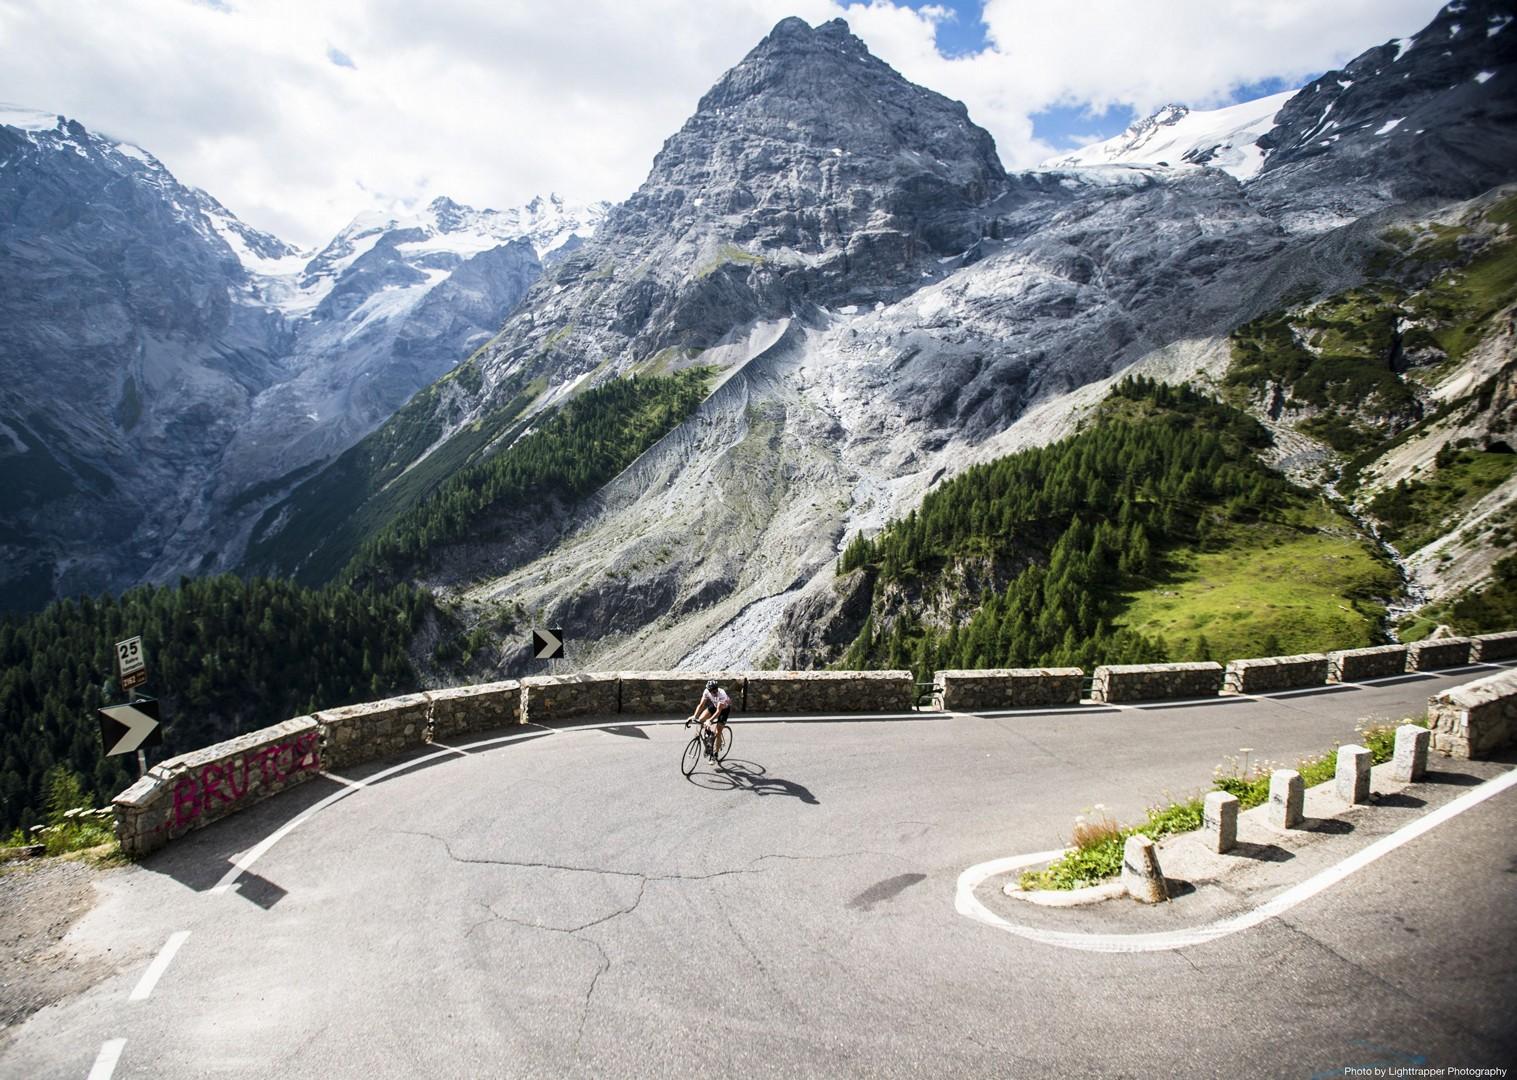 italy-italian-alps-guided-road-cycling-holiday.jpg - Italy - Italian Alps Introduction - Guided Road Cycling Holiday - Road Cycling